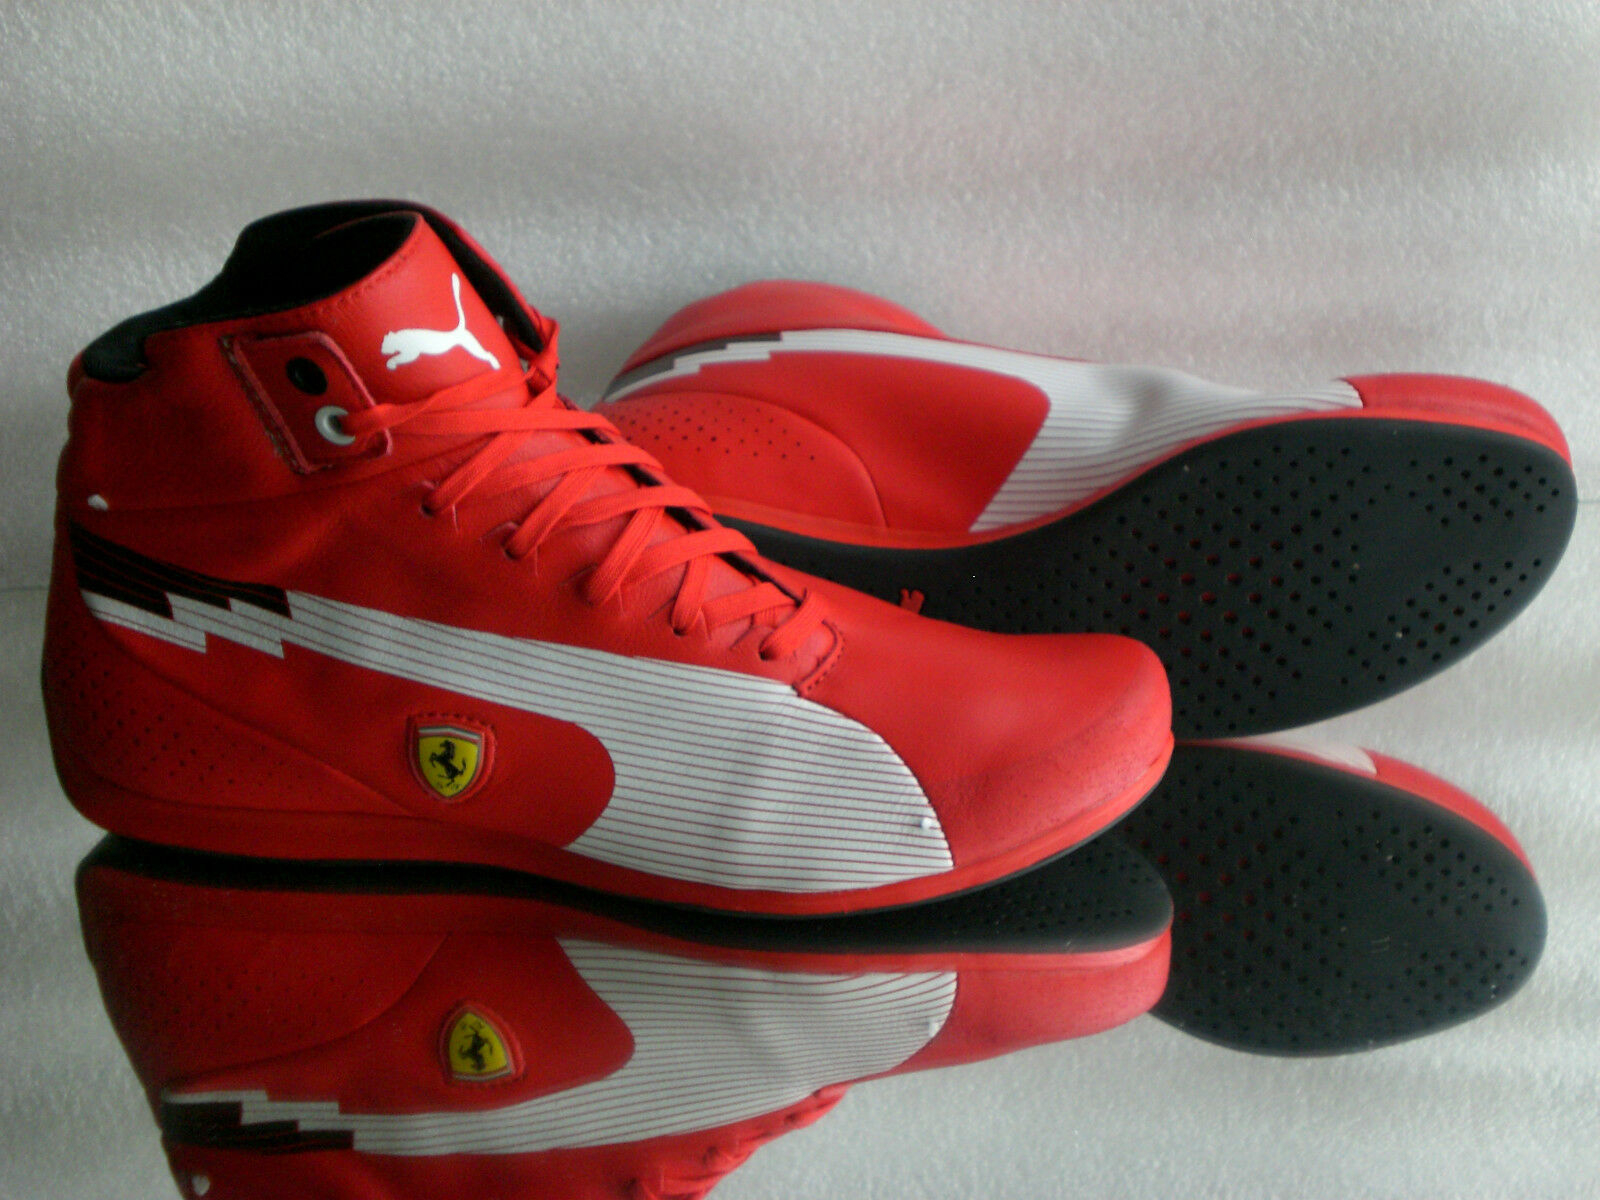 Original Puma Ferrari Gr: Speed Mid Men Sneaker TurnLaufschuh Stiefel Gr: Ferrari 39-42 +Bag be8a4f